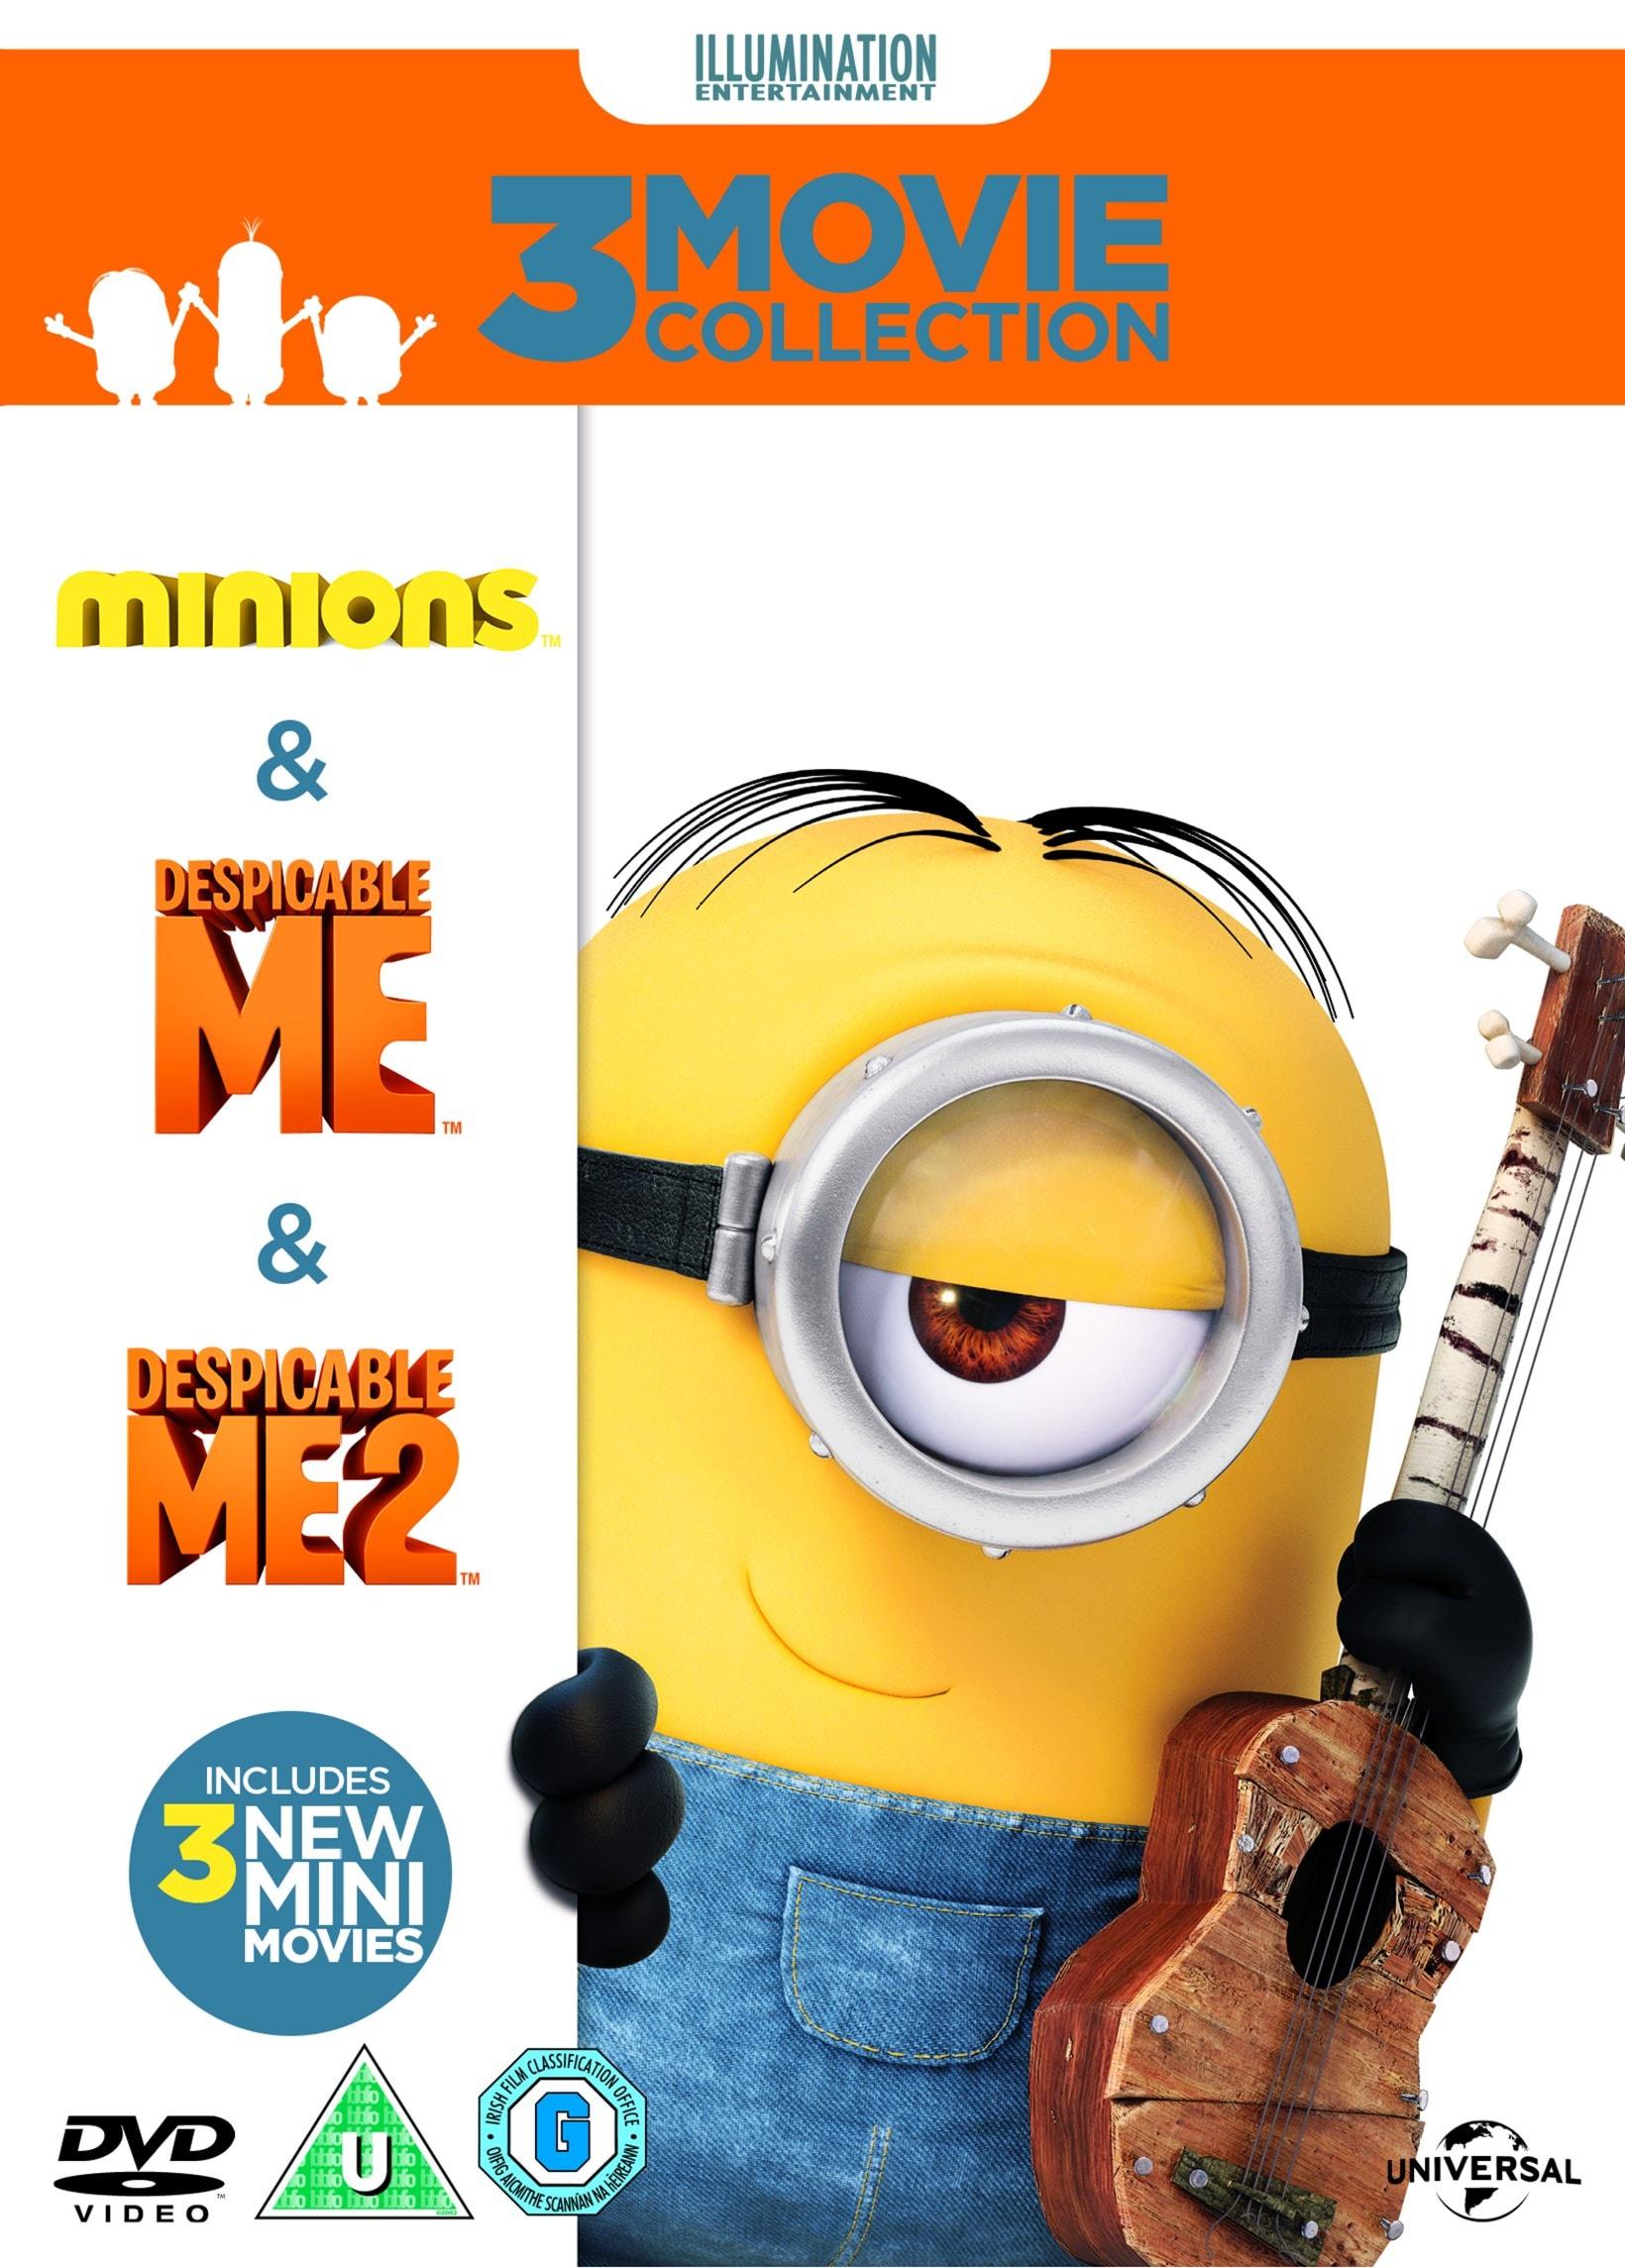 Despicable Me/Despicable Me 2/Minions